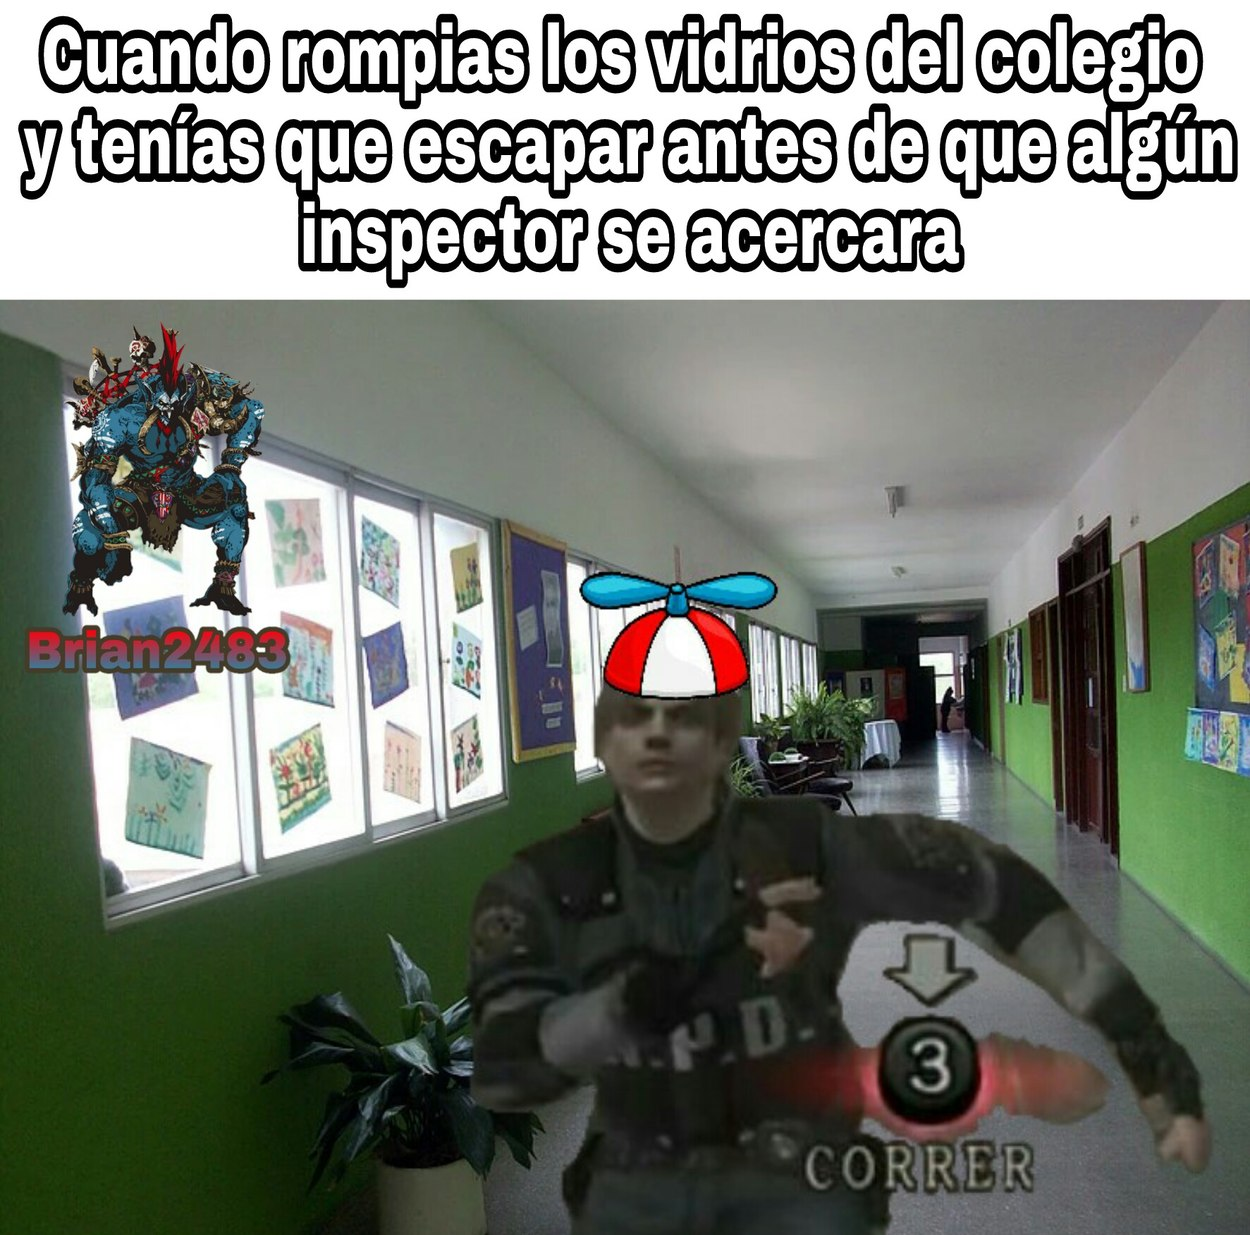 Costo recortar xd(Original) - meme